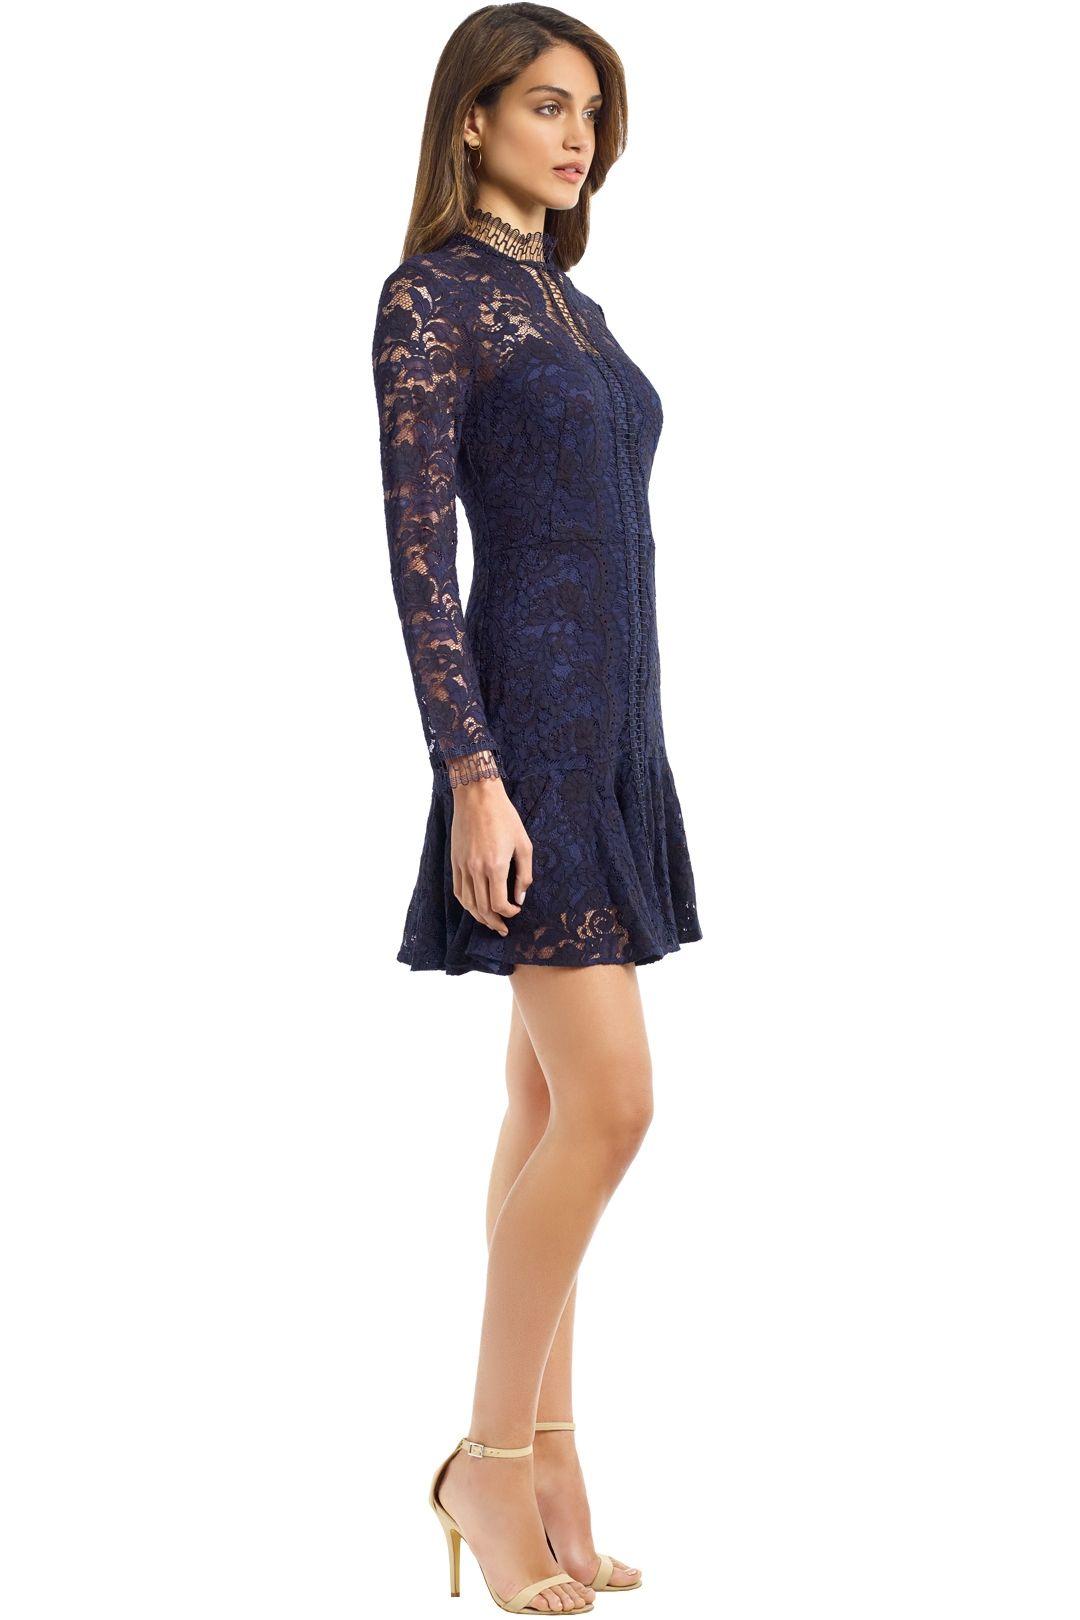 Lover - Cecilia Mini Dress - Navy - Side